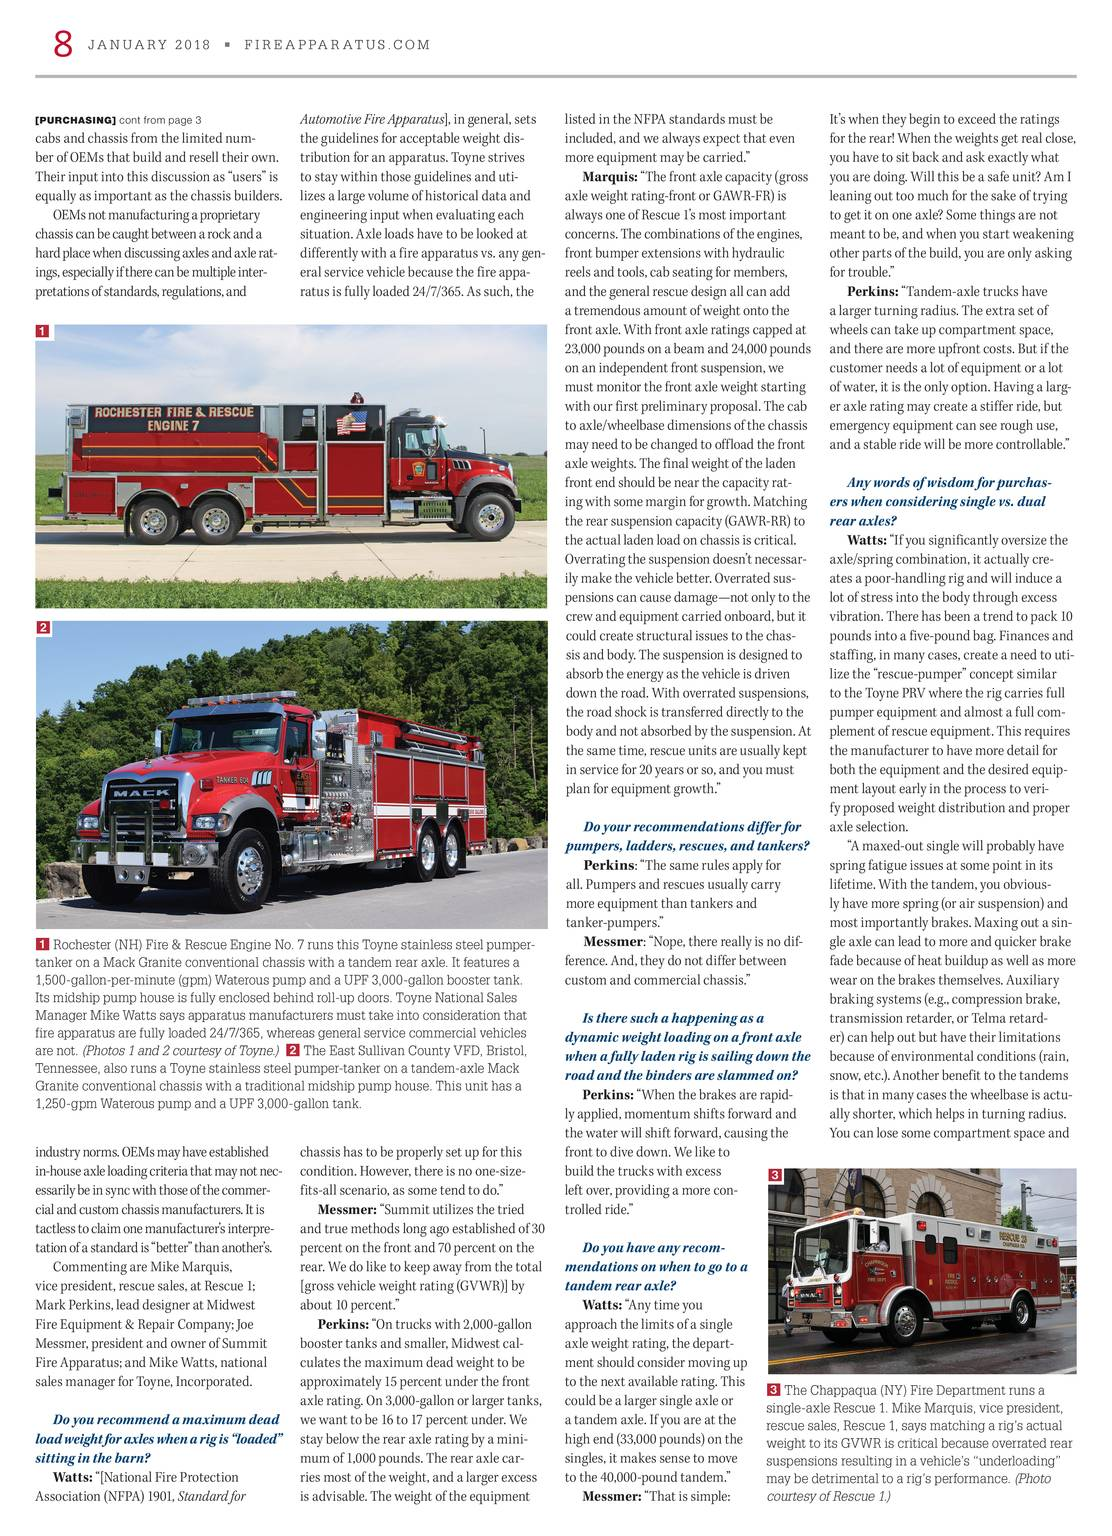 Fire Apparatus Magazine - January 2018 - page 9